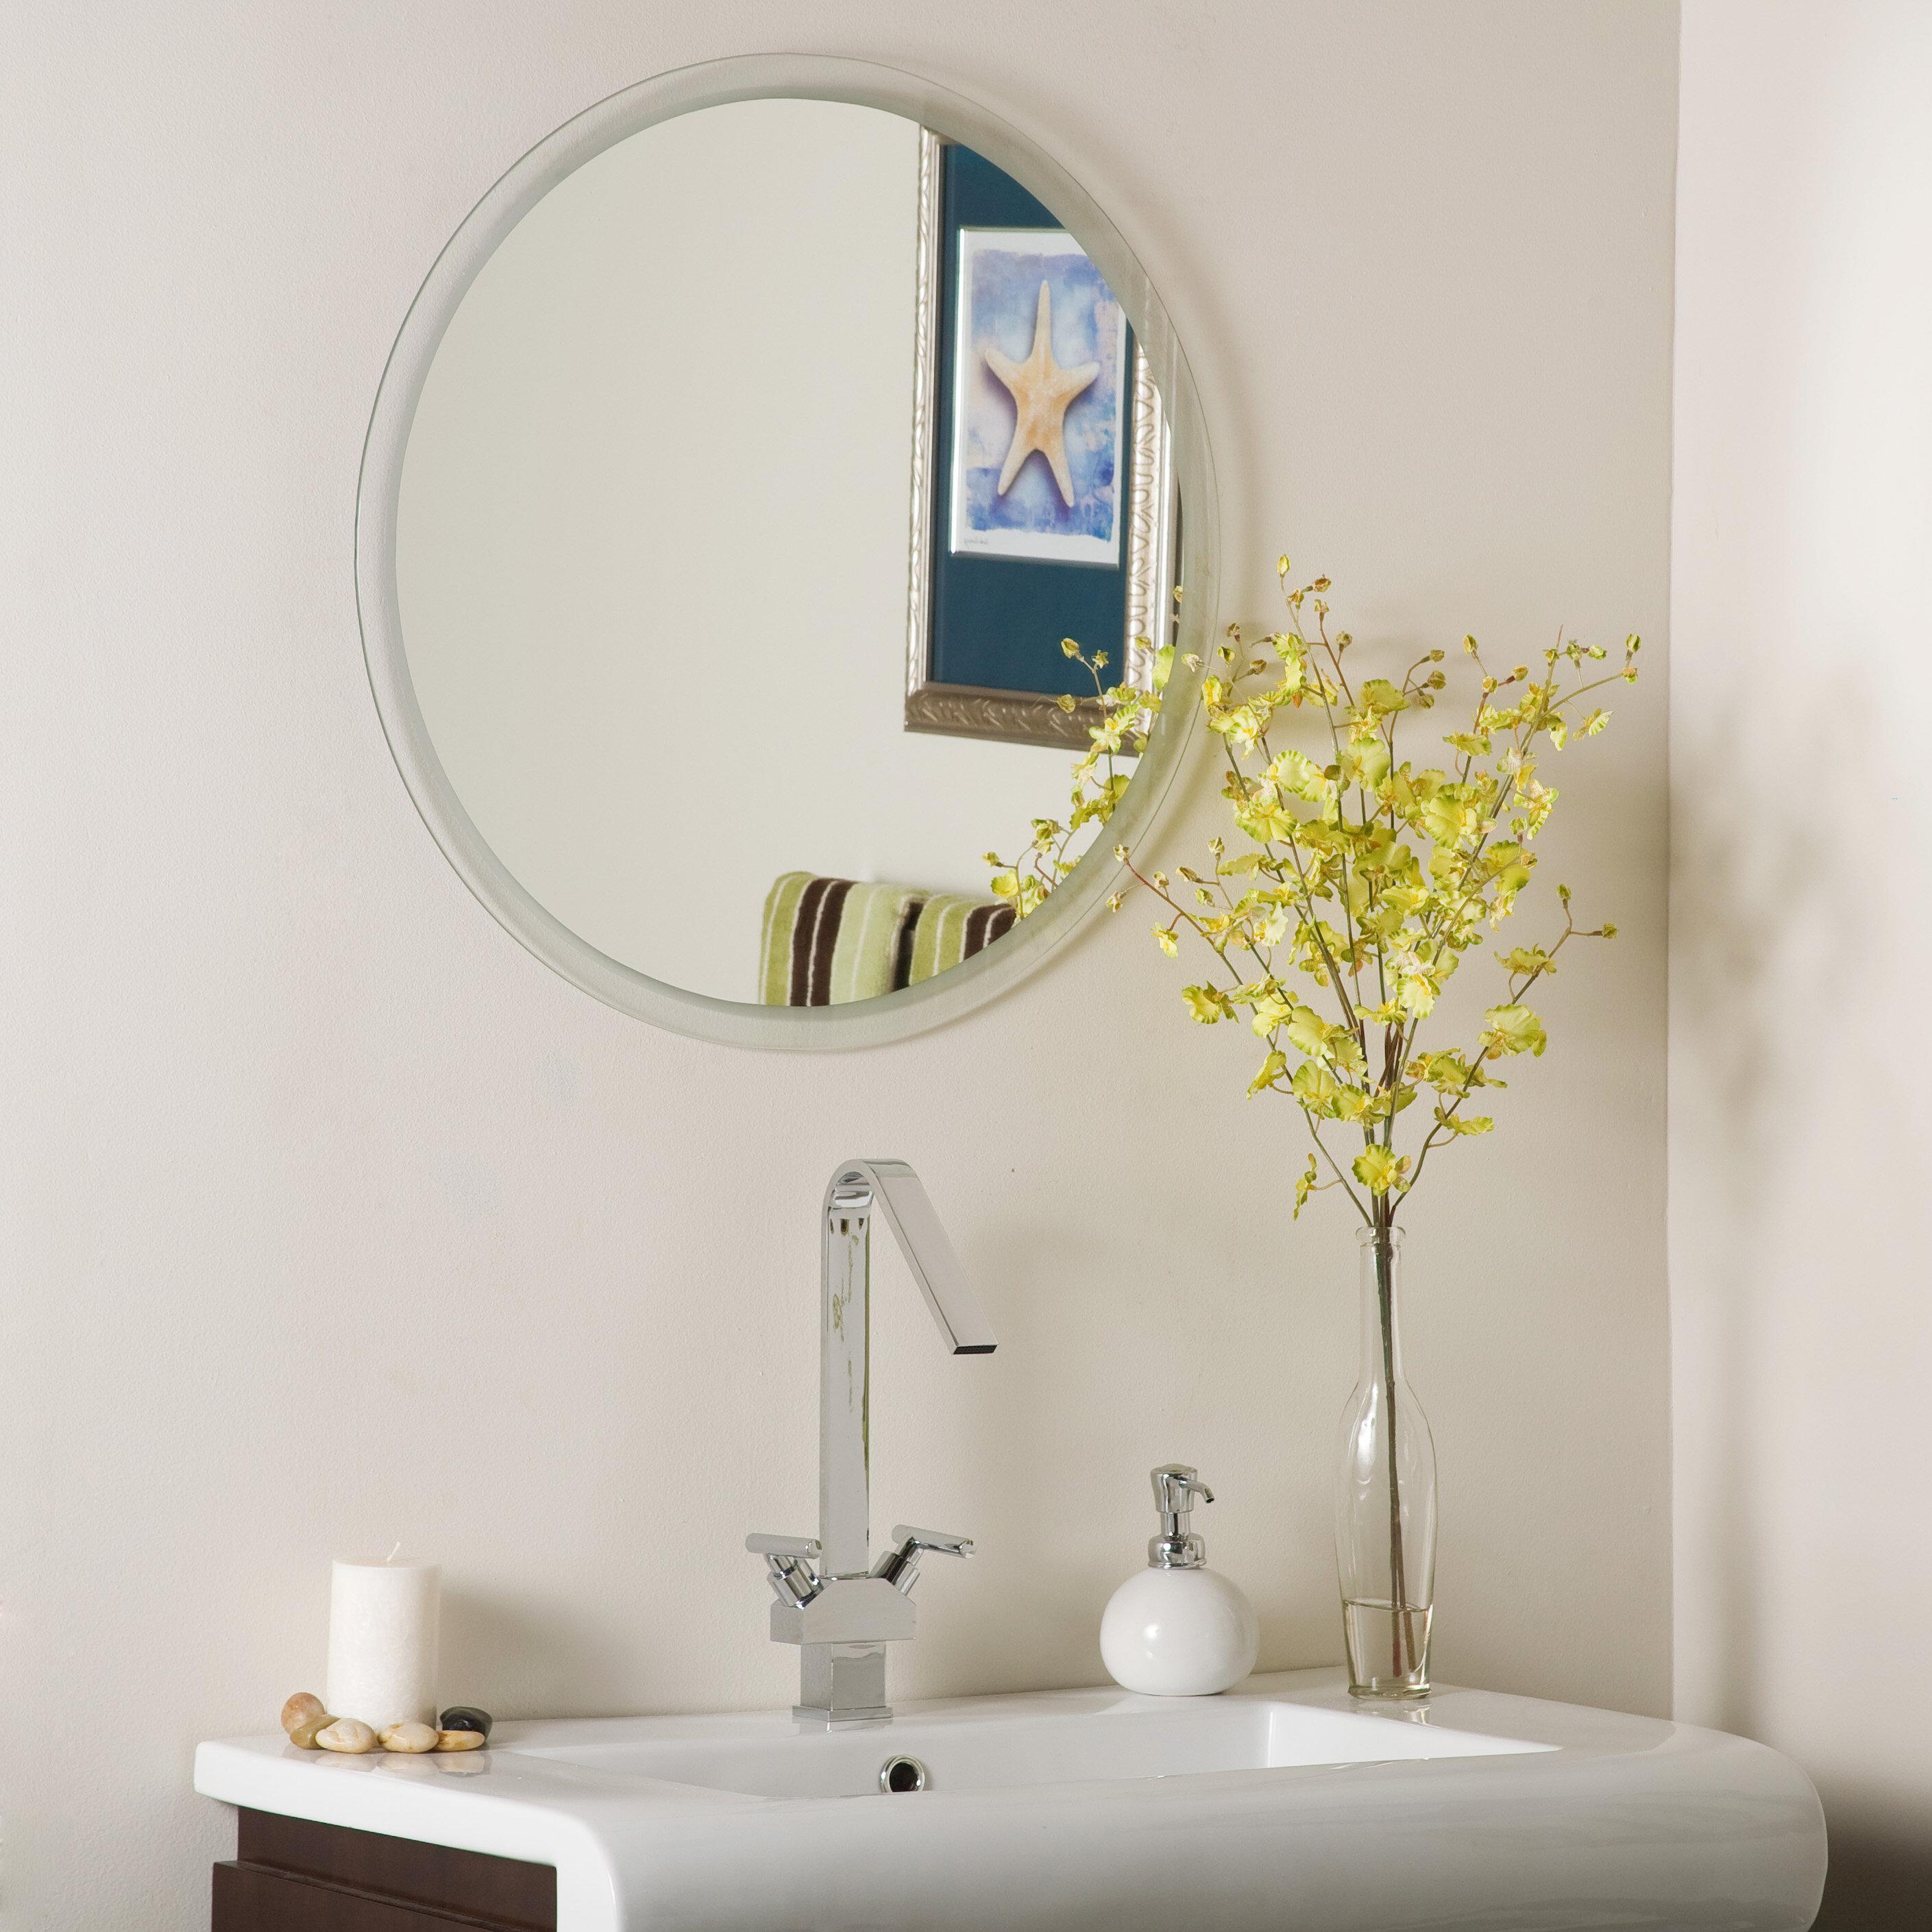 Decor Wonderland Frameless Beveled Karnia Wall Mirror & Reviews ...